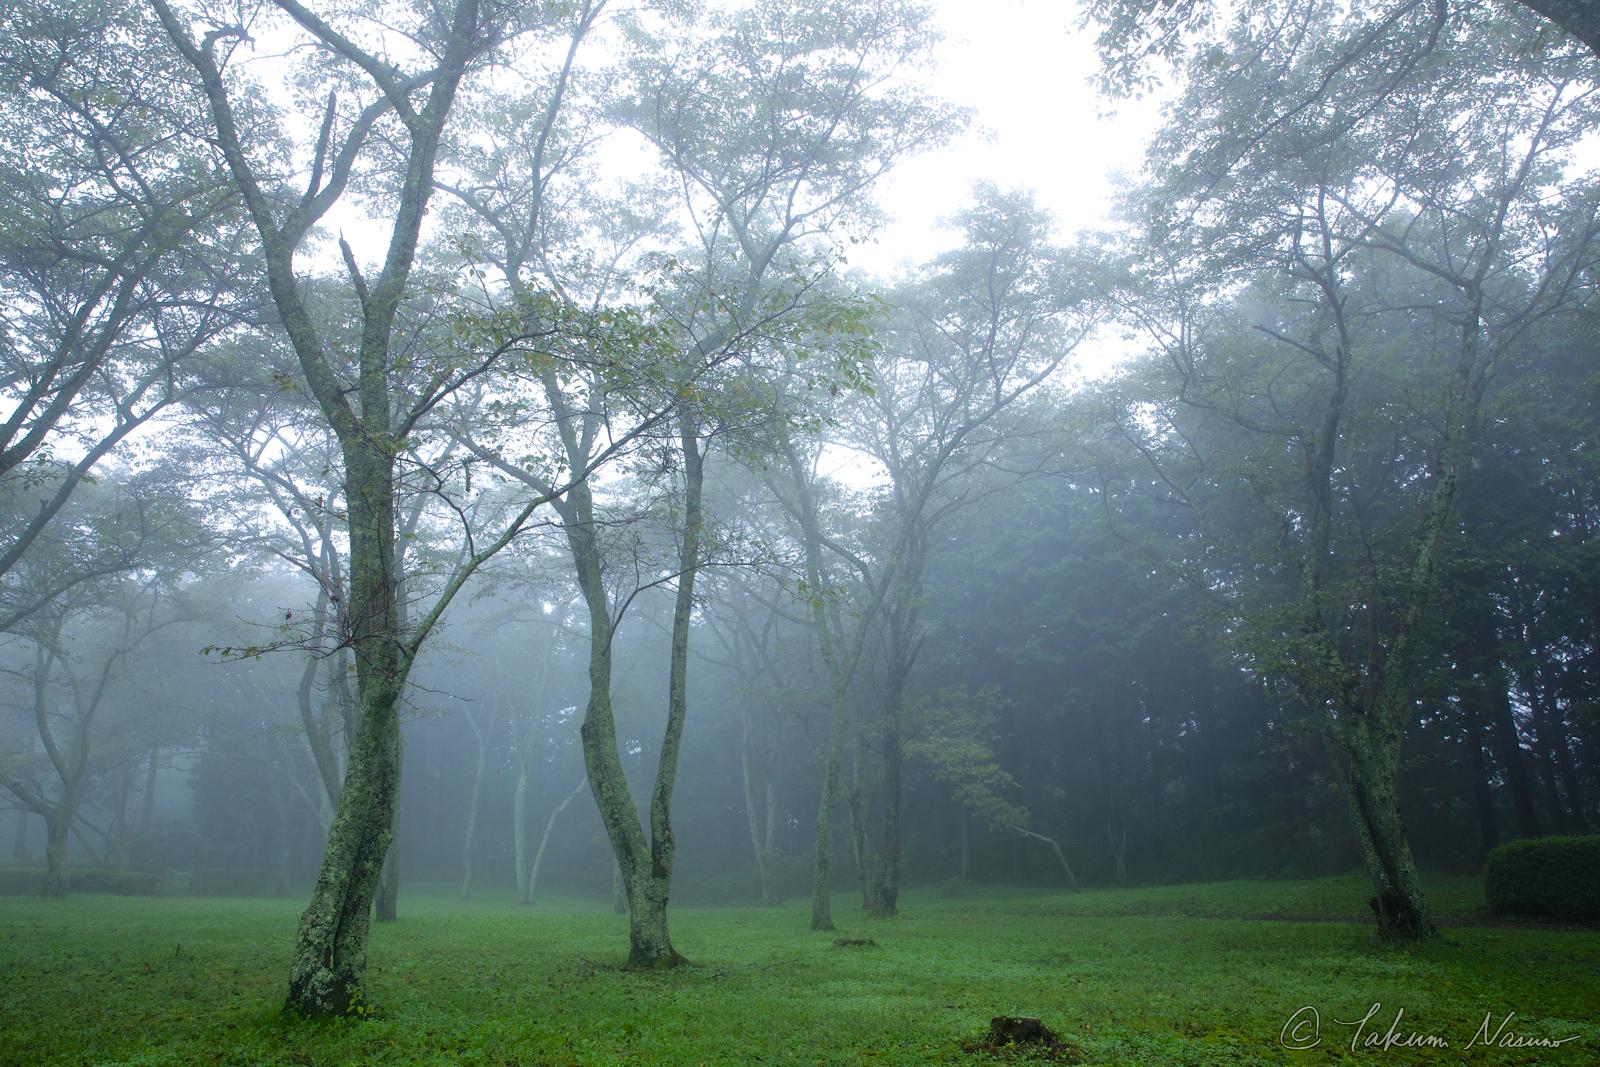 Tanagura Photo Contenst - Morning mist and Silence